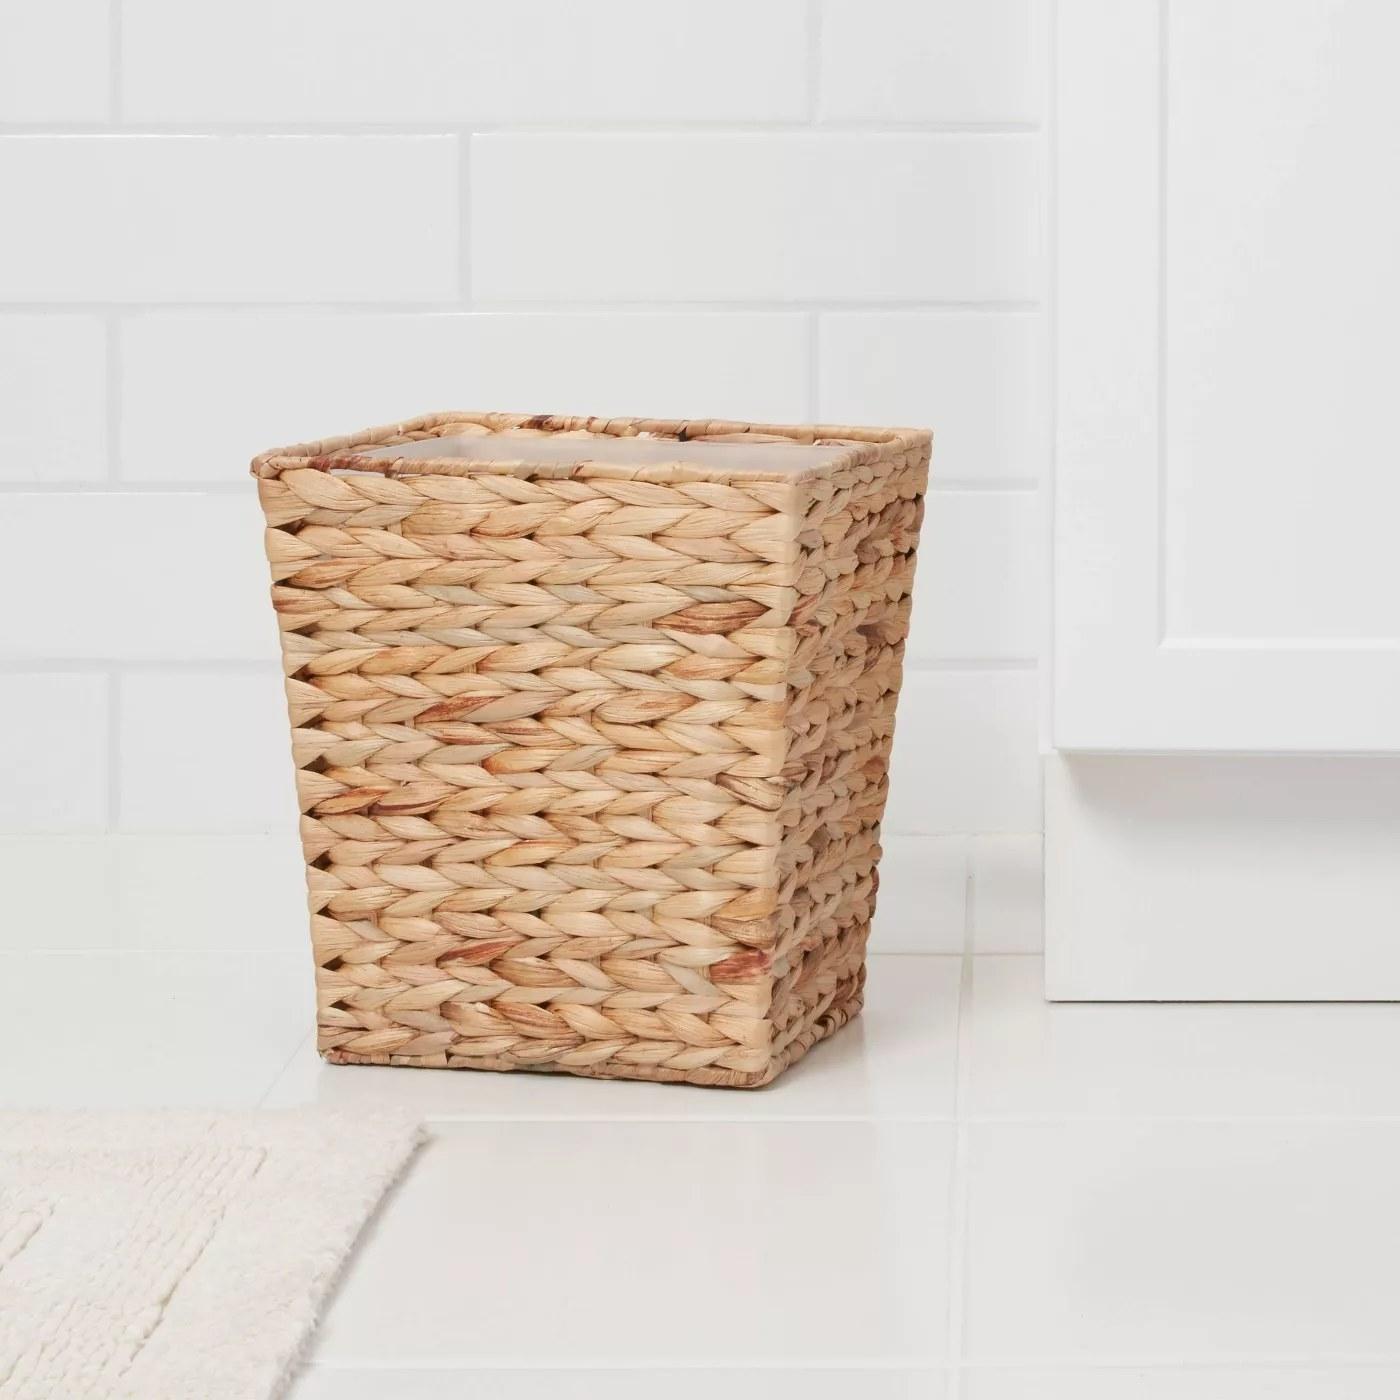 A waste basket